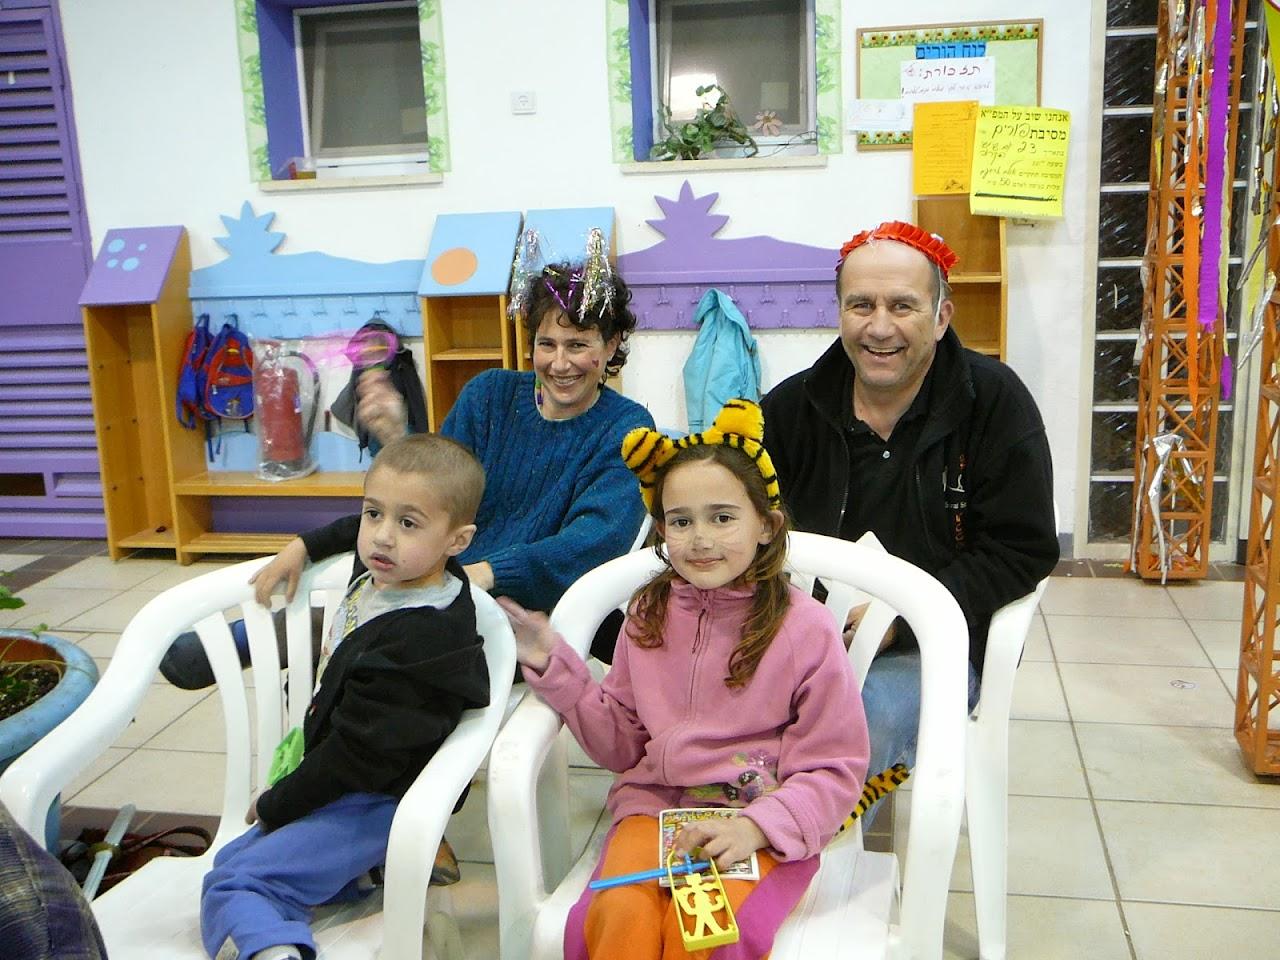 Purim 2007  - 2007-03-03 12.38.42.jpg